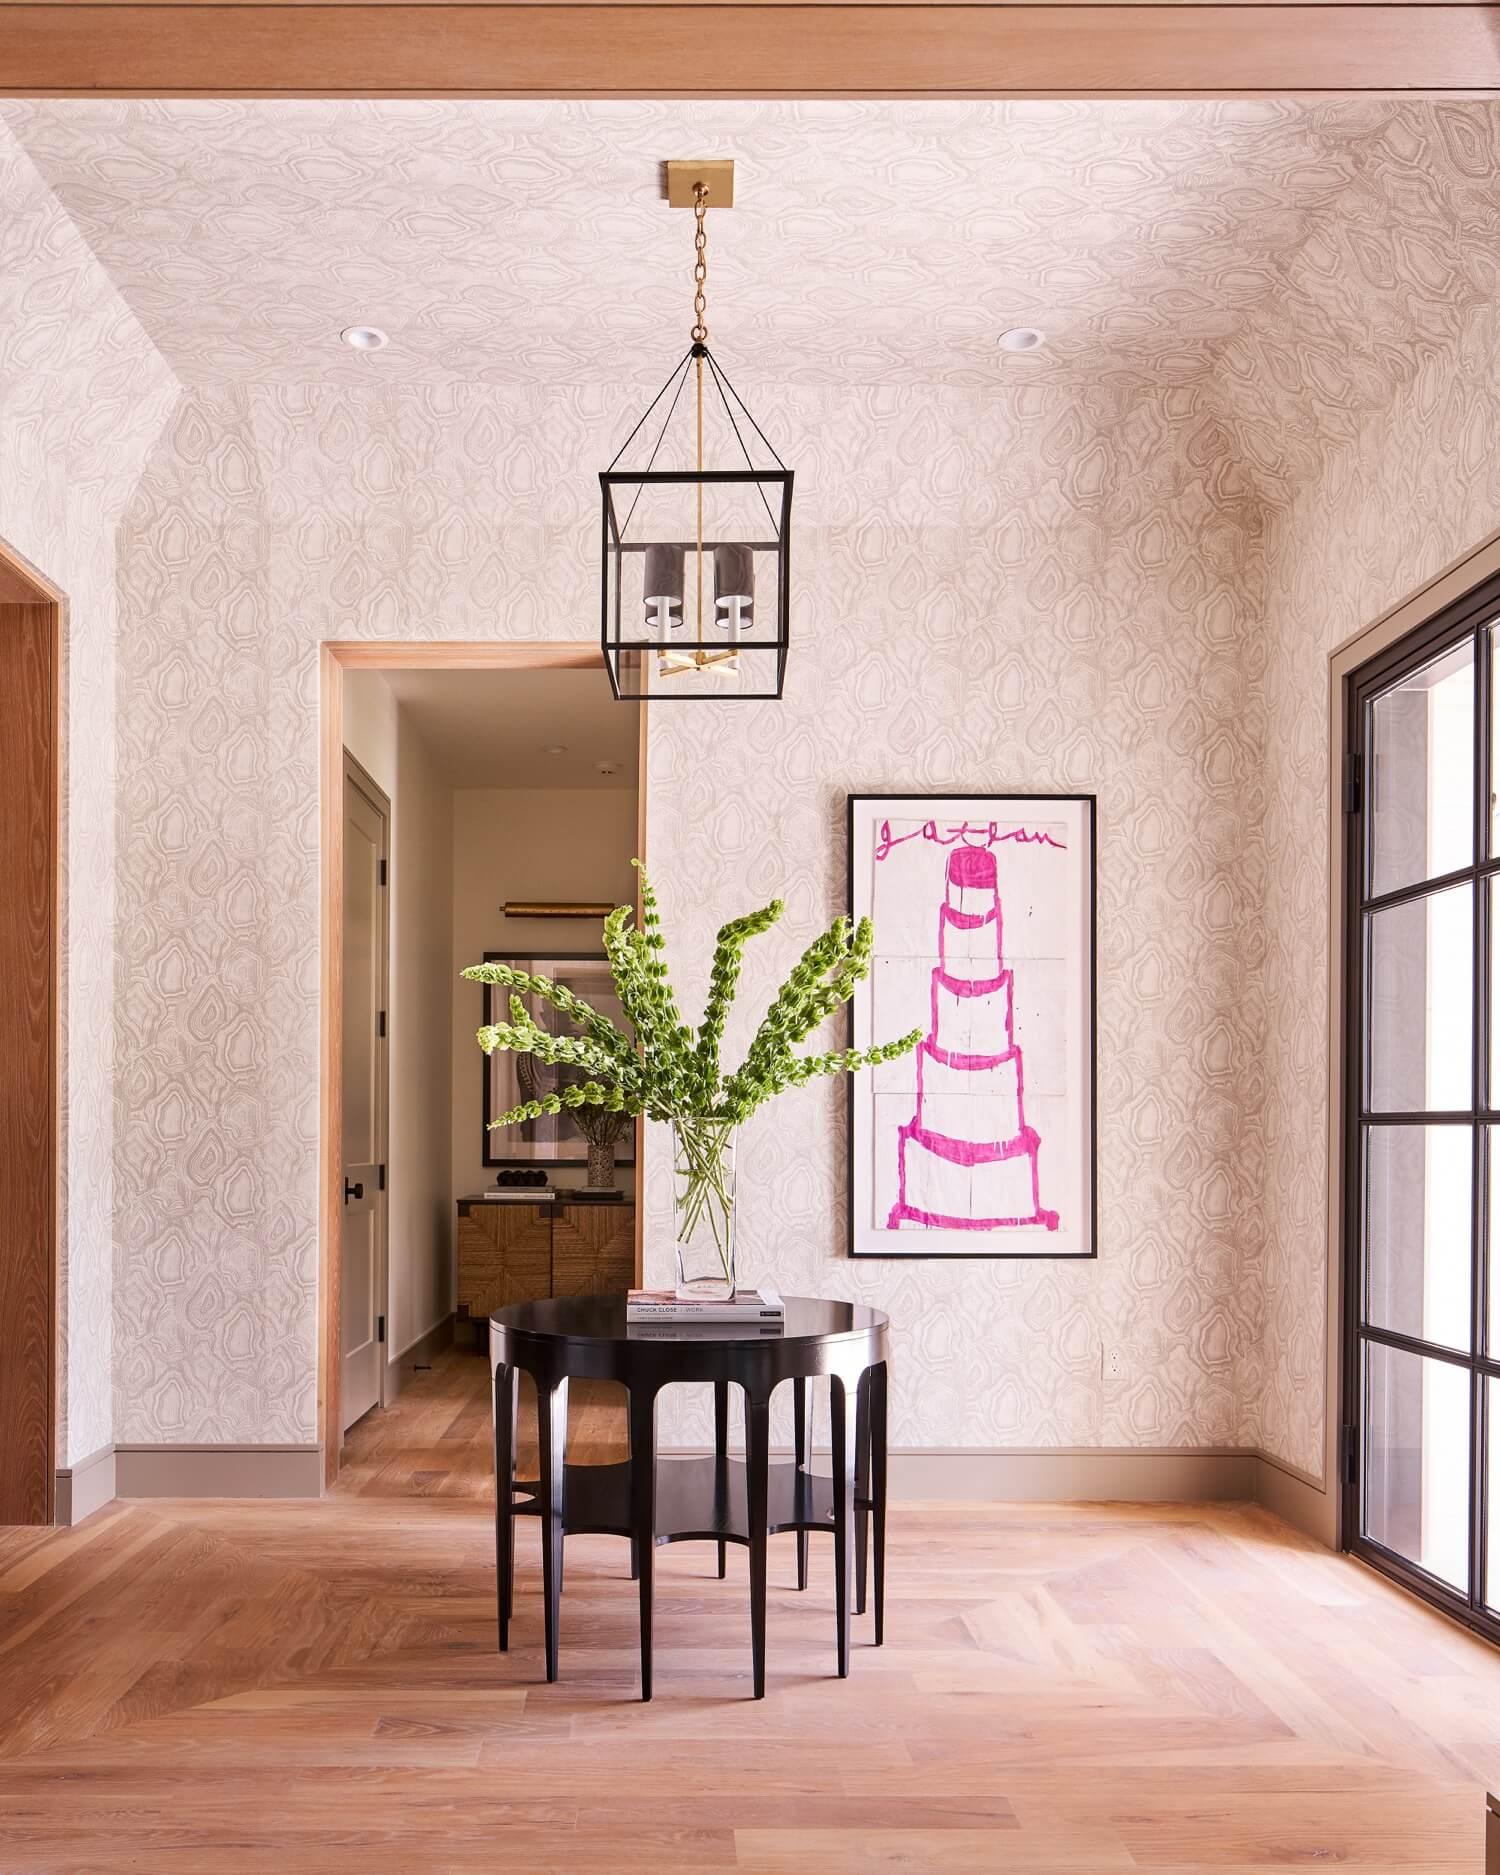 A beautiful backdrop for life's memories Best Children's Lighting & Home Decor Online Store